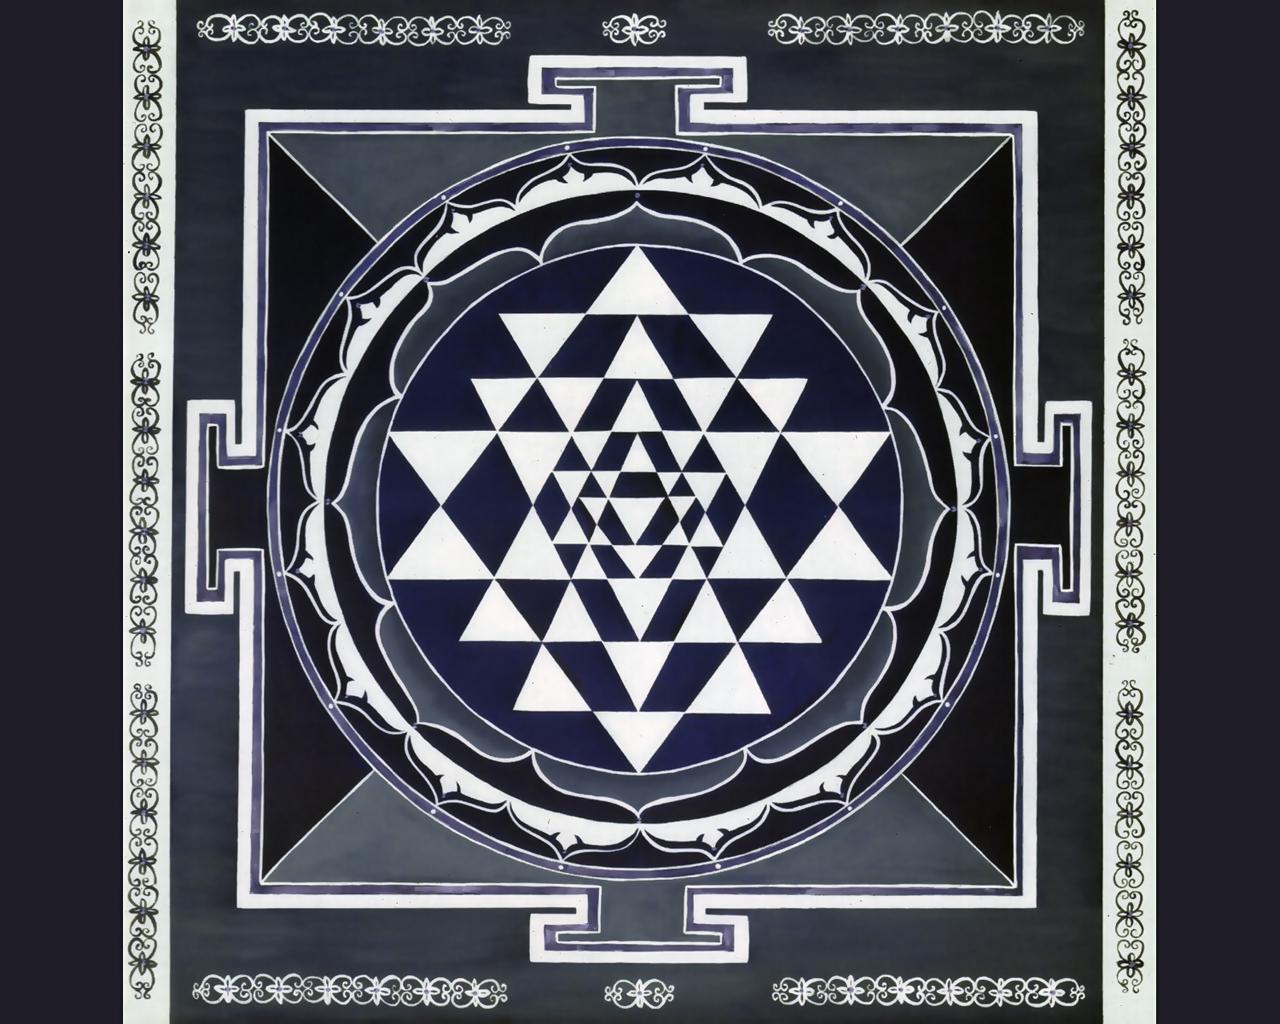 Sri Yantra Wallpapers